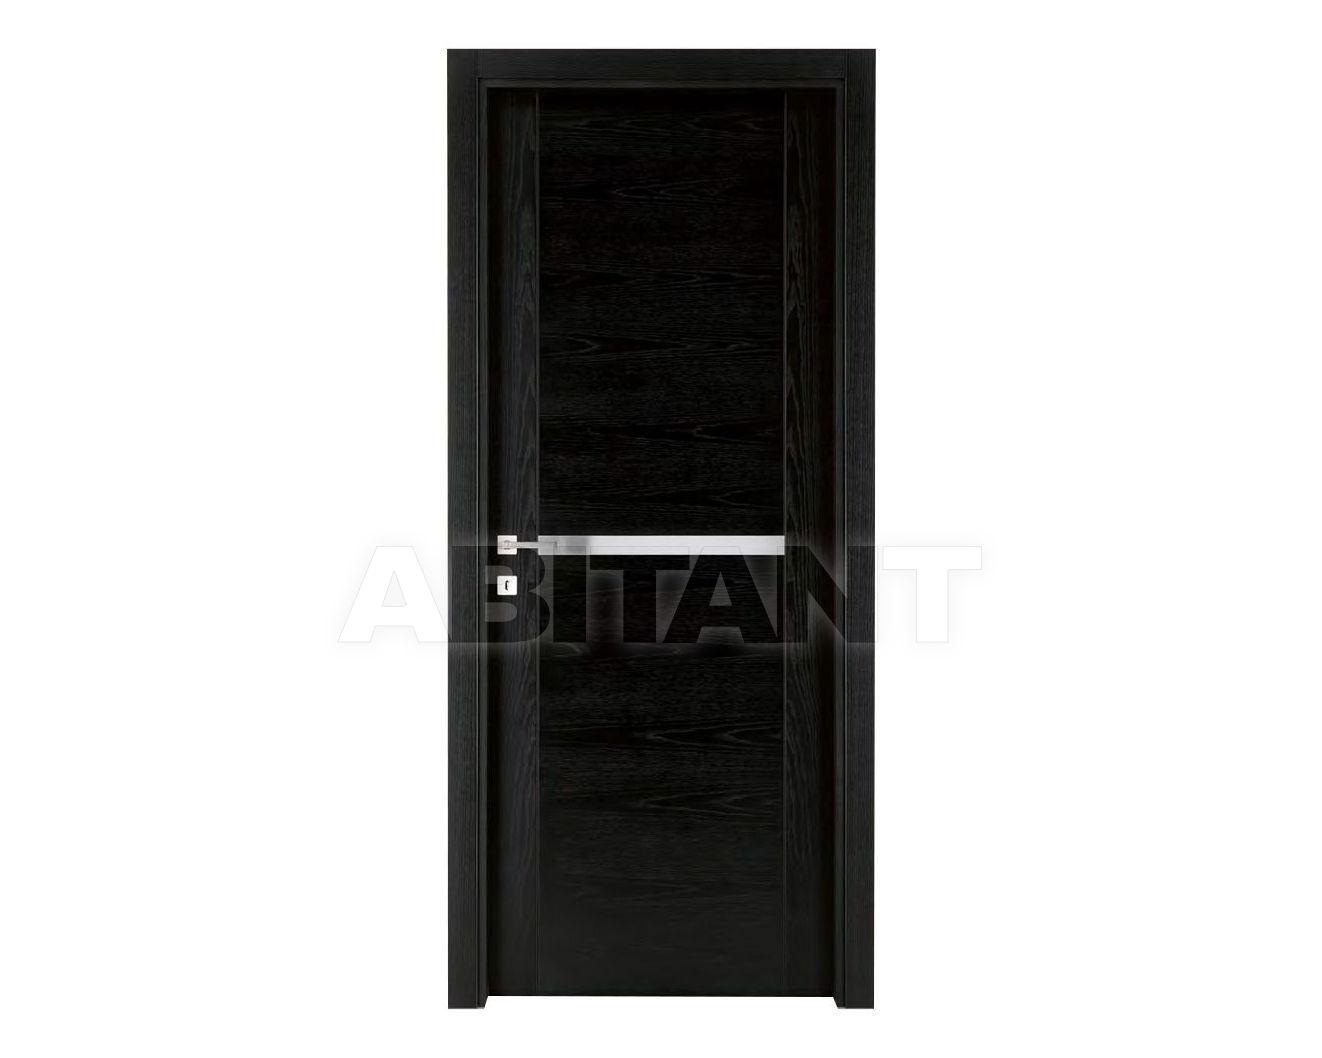 Купить Дверь деревянная Fioravazzi Modulo S45 TRATTO X